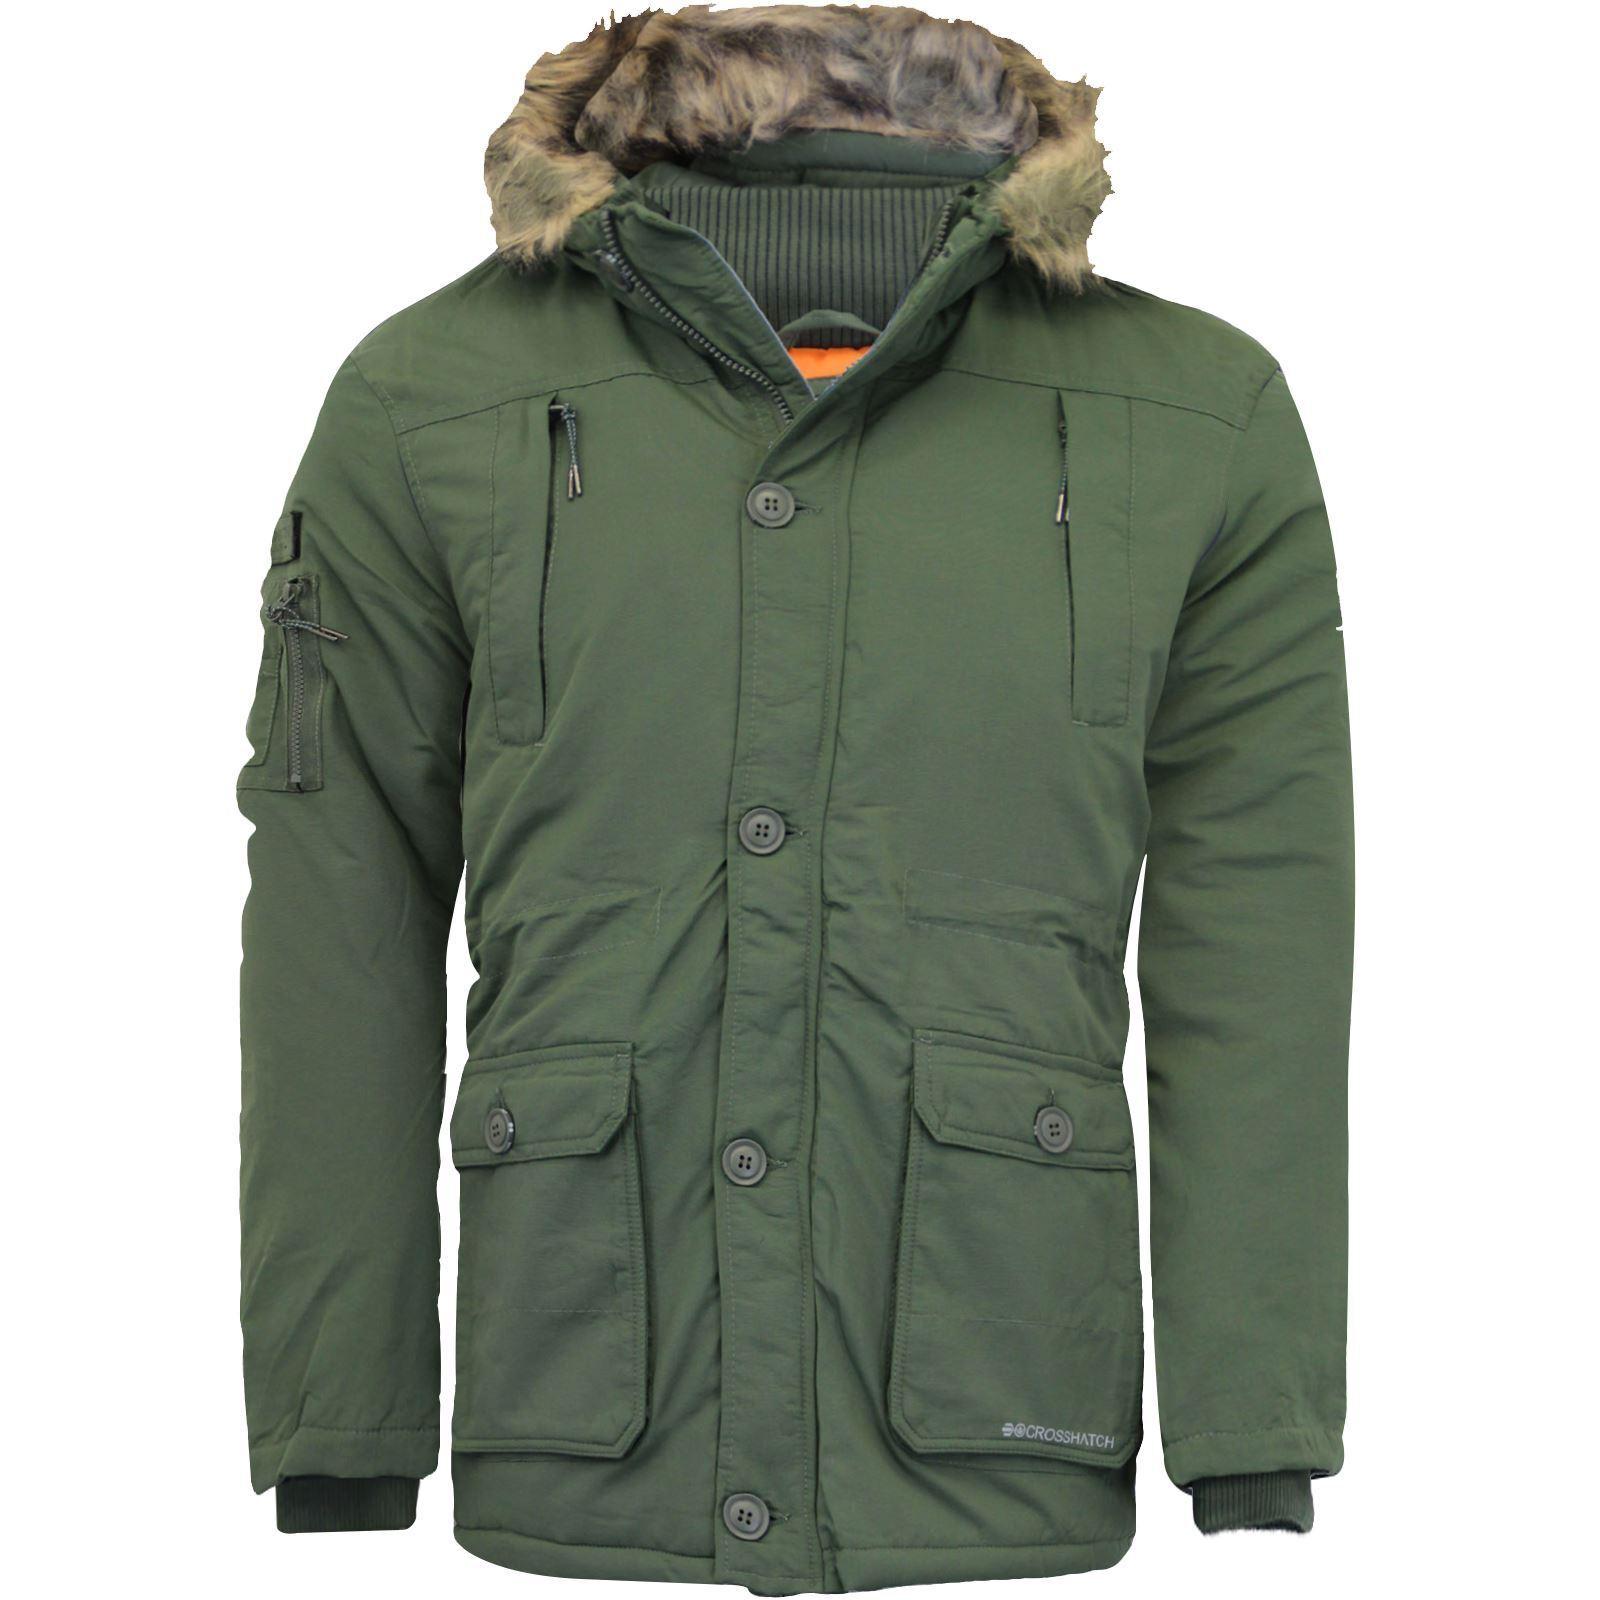 Weight Crosshatch New Hood Parka Coat Jacket Mens Winter Heavy Padded Brand Fur cF1JlK